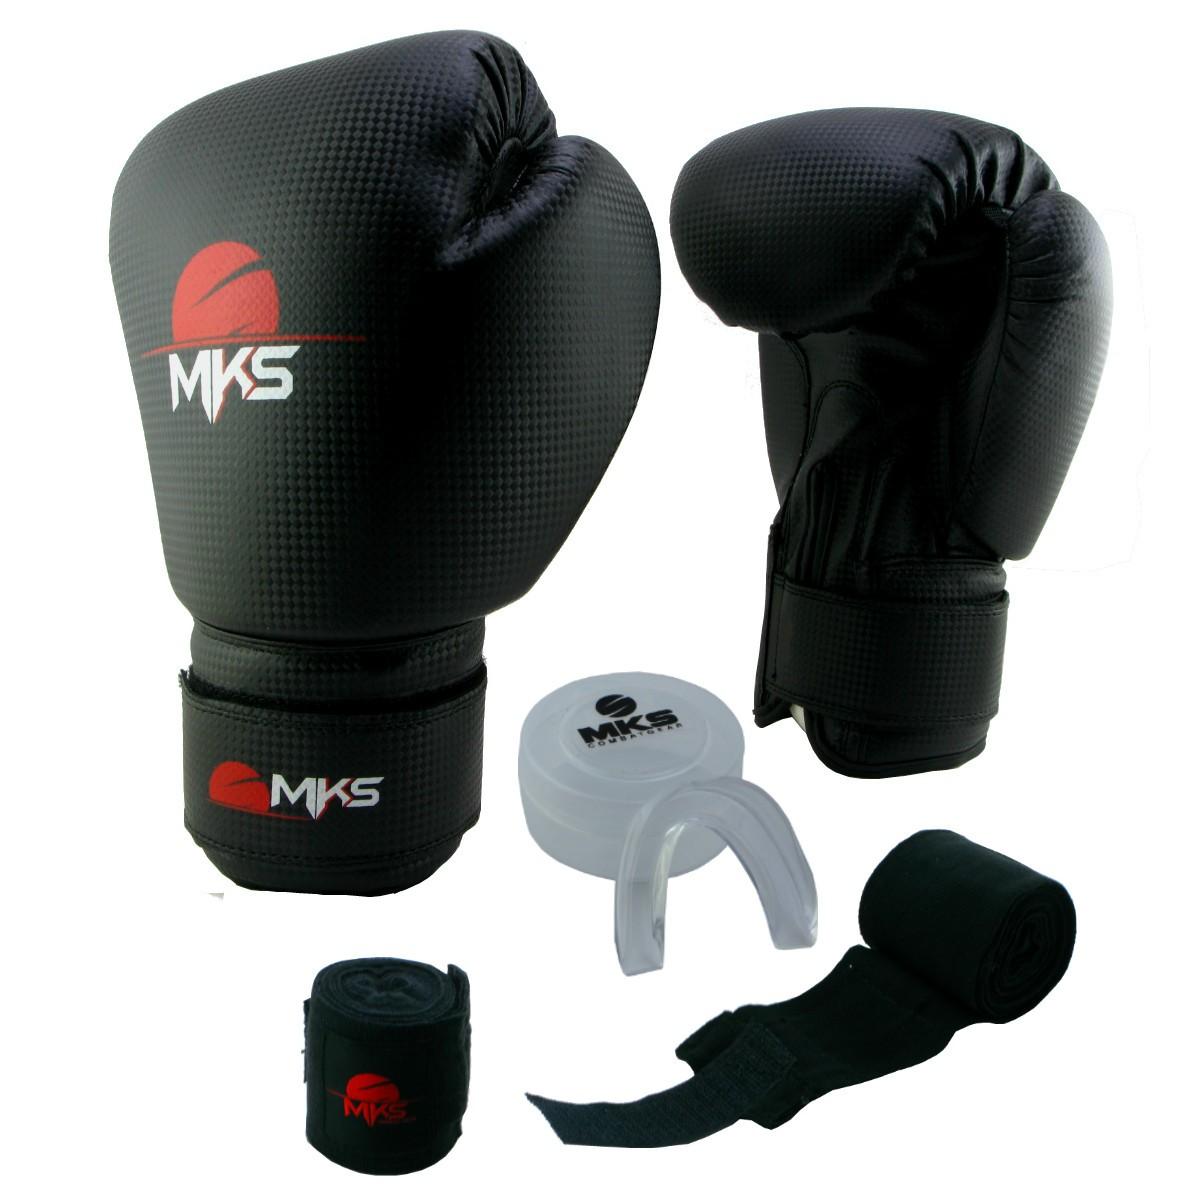 Luva de Boxe Prospect MKS Preta 14 oz + Protetor Bucal + Bandagem